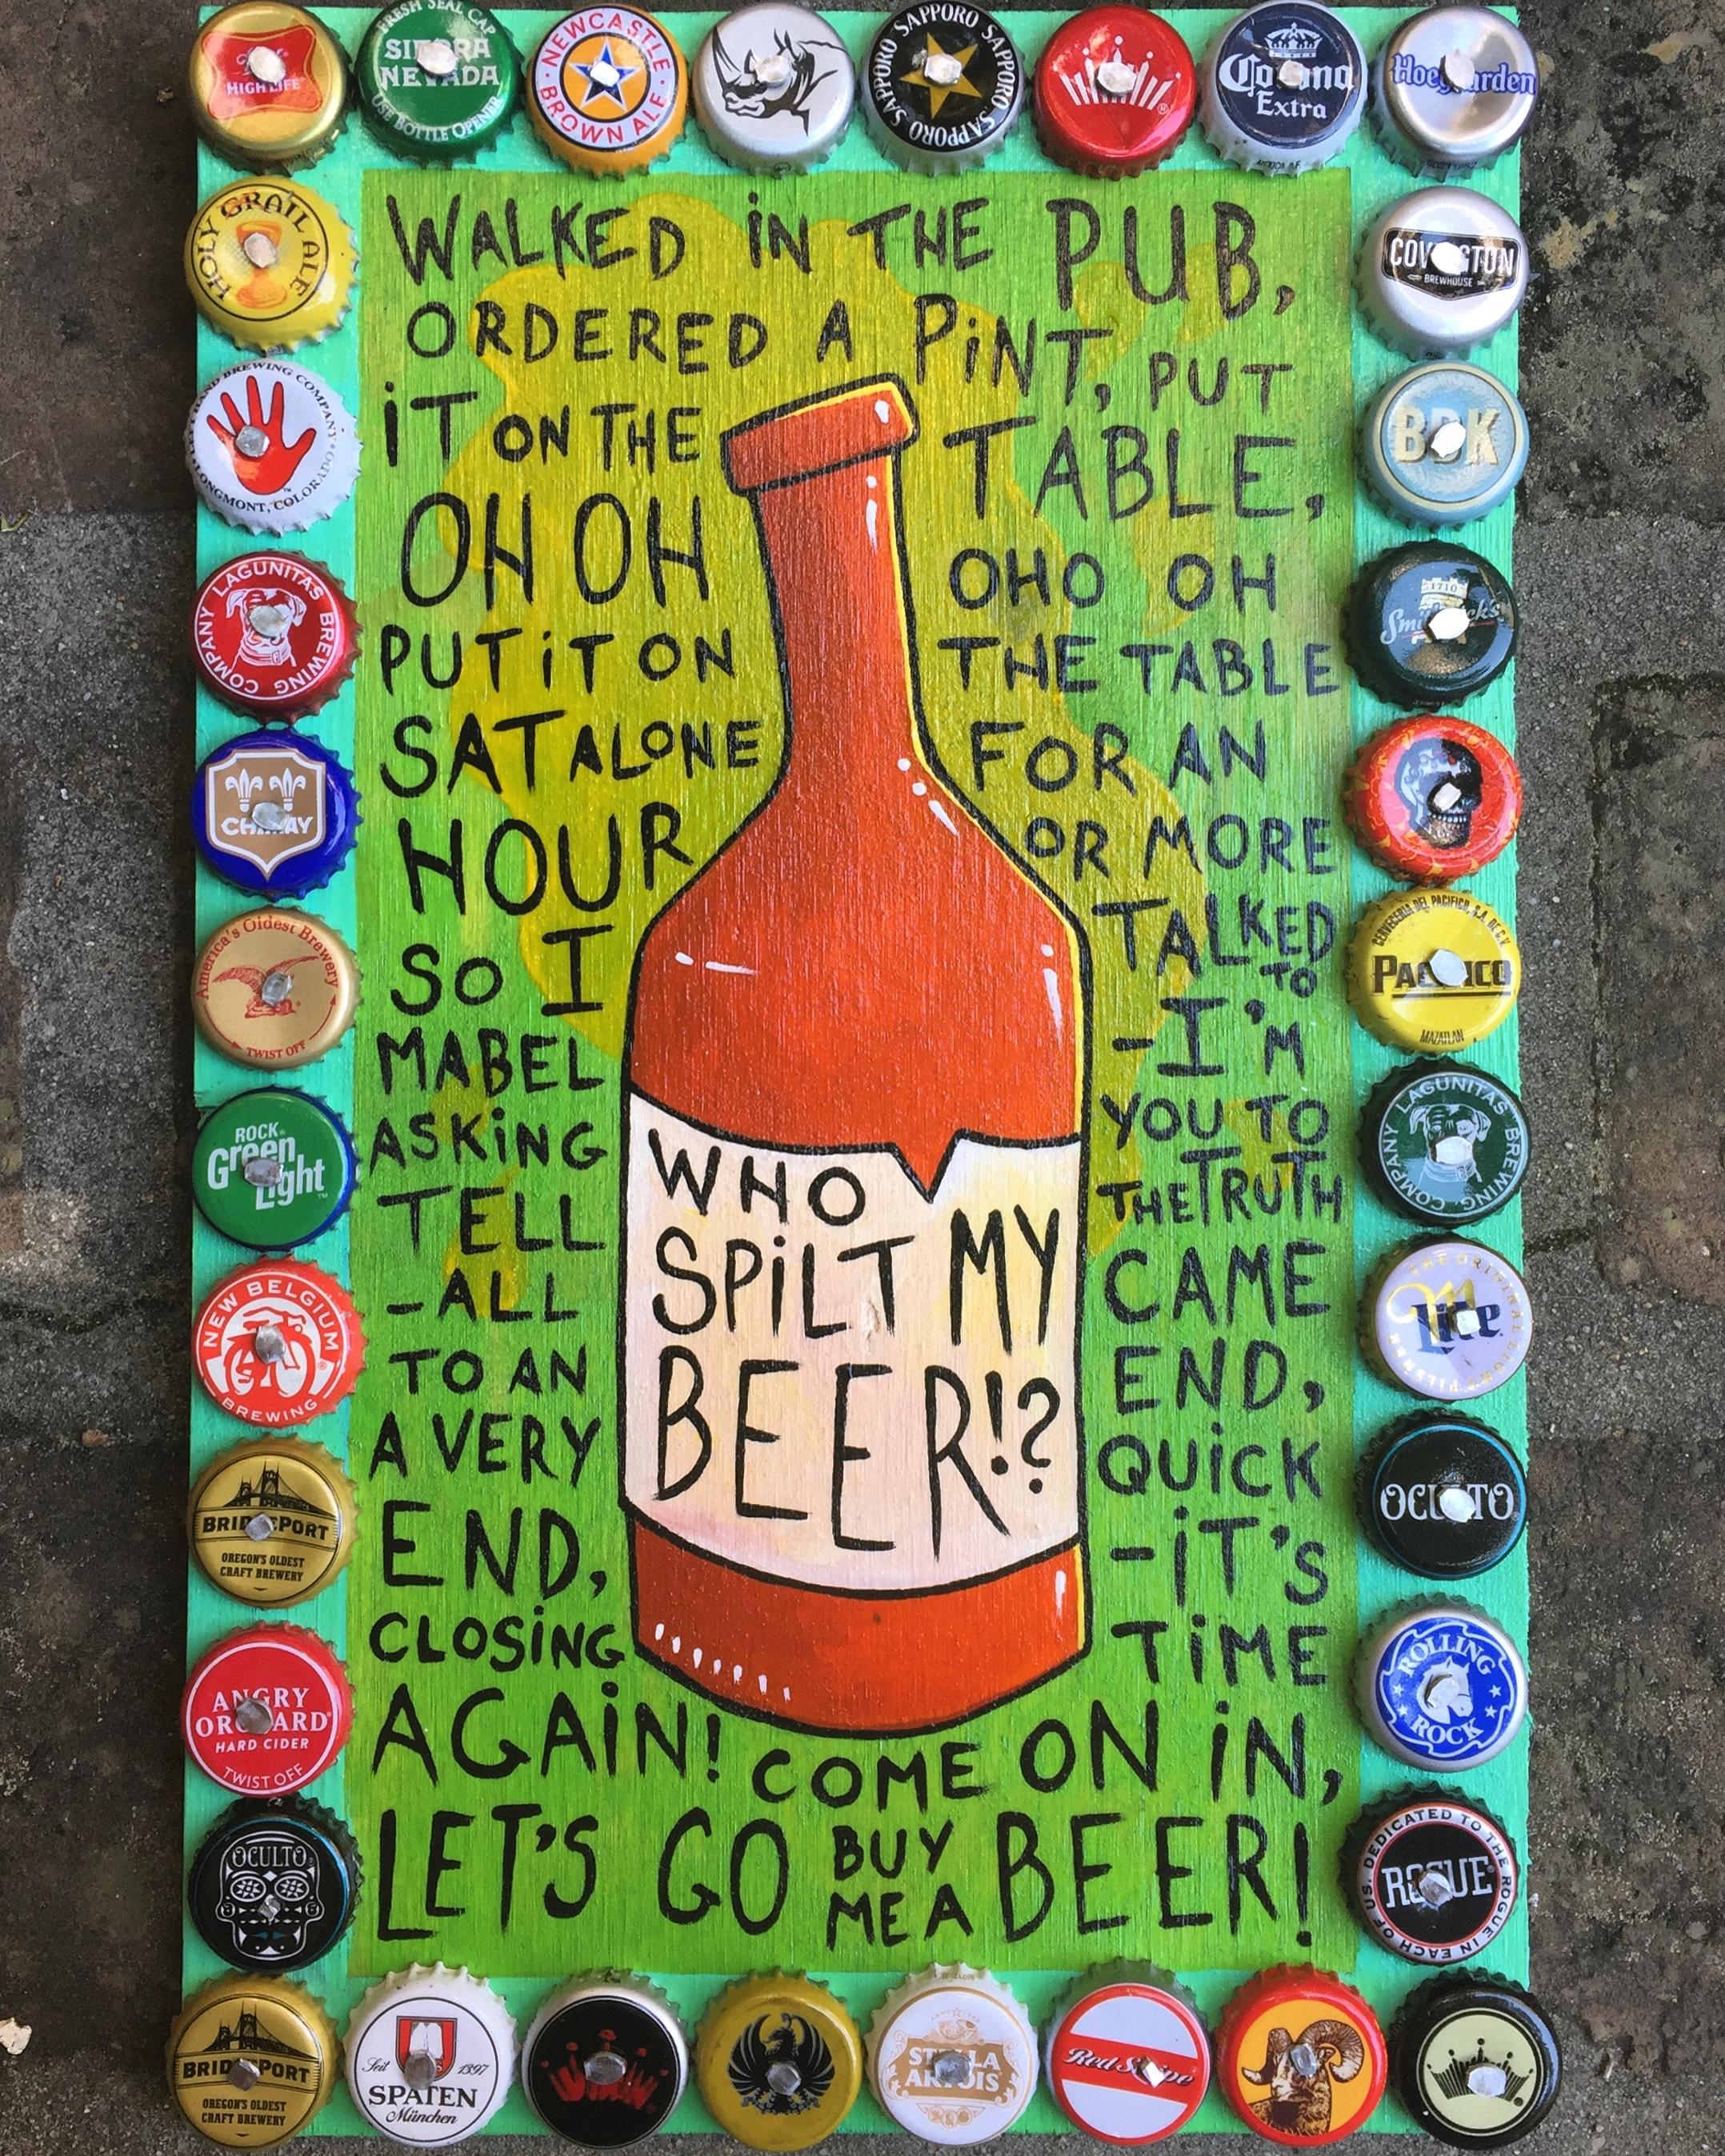 Who Spilt My Beer!?